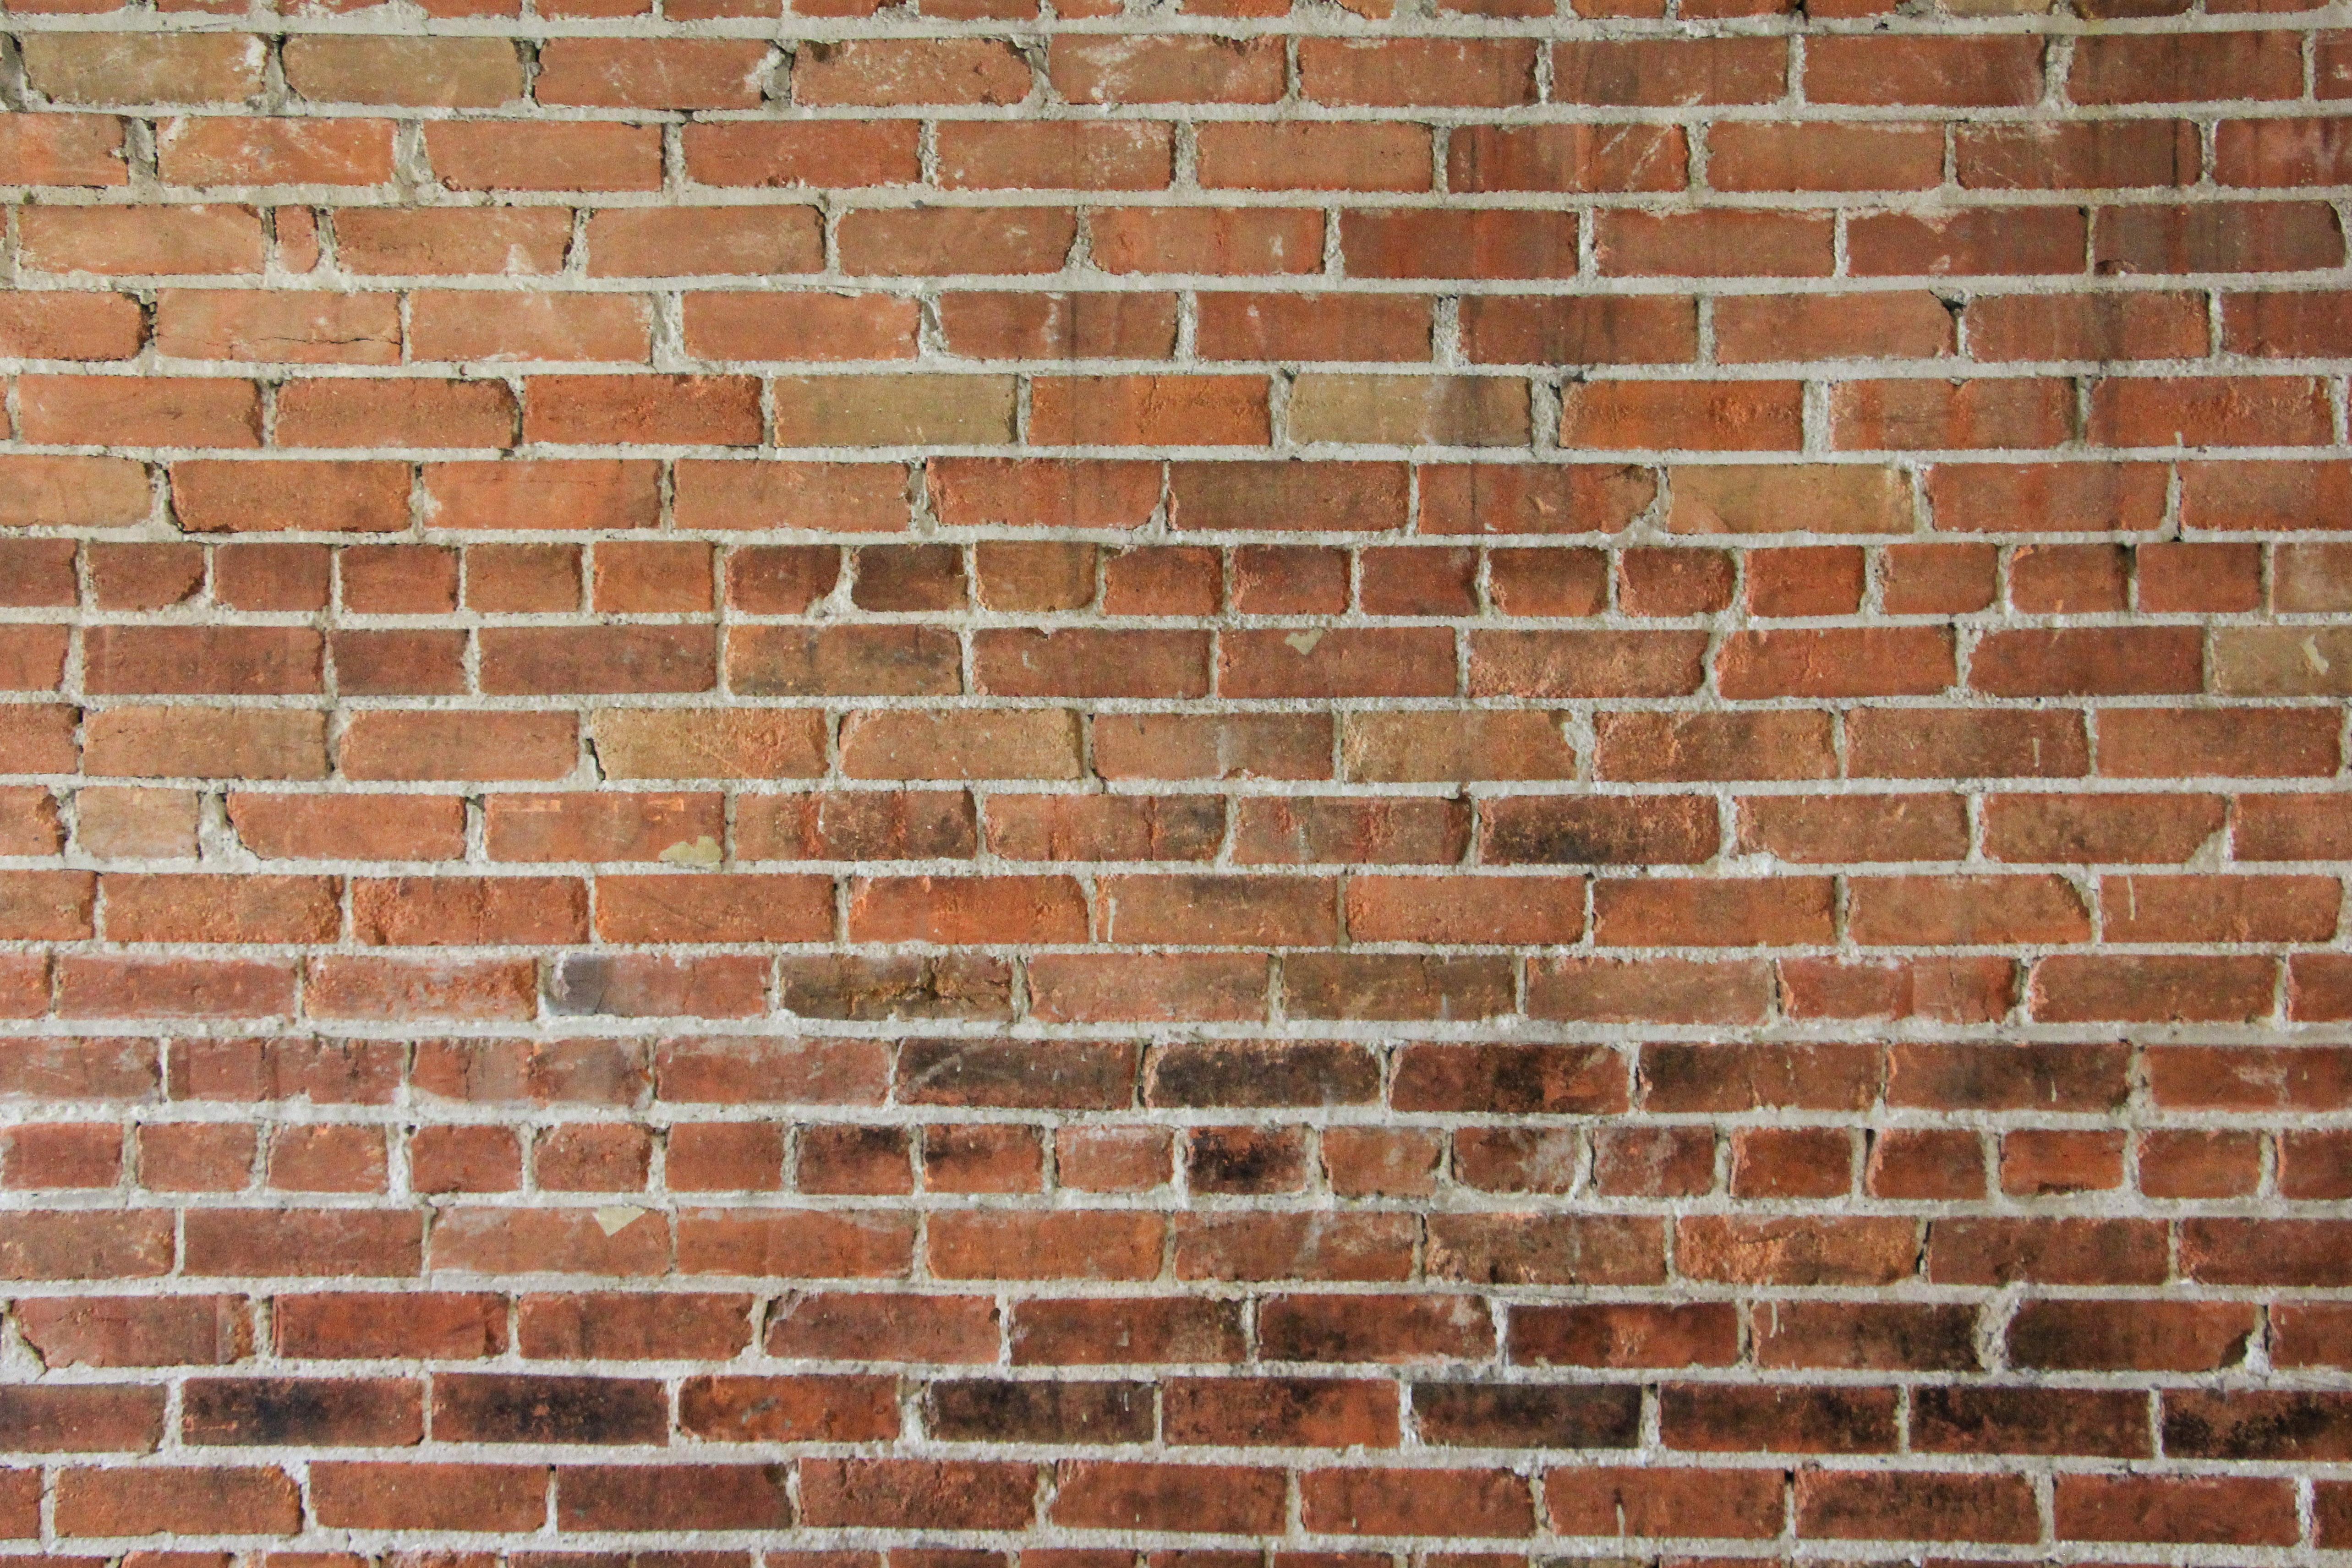 rough brick texture wallpaper black red masonry block - TextureX ...